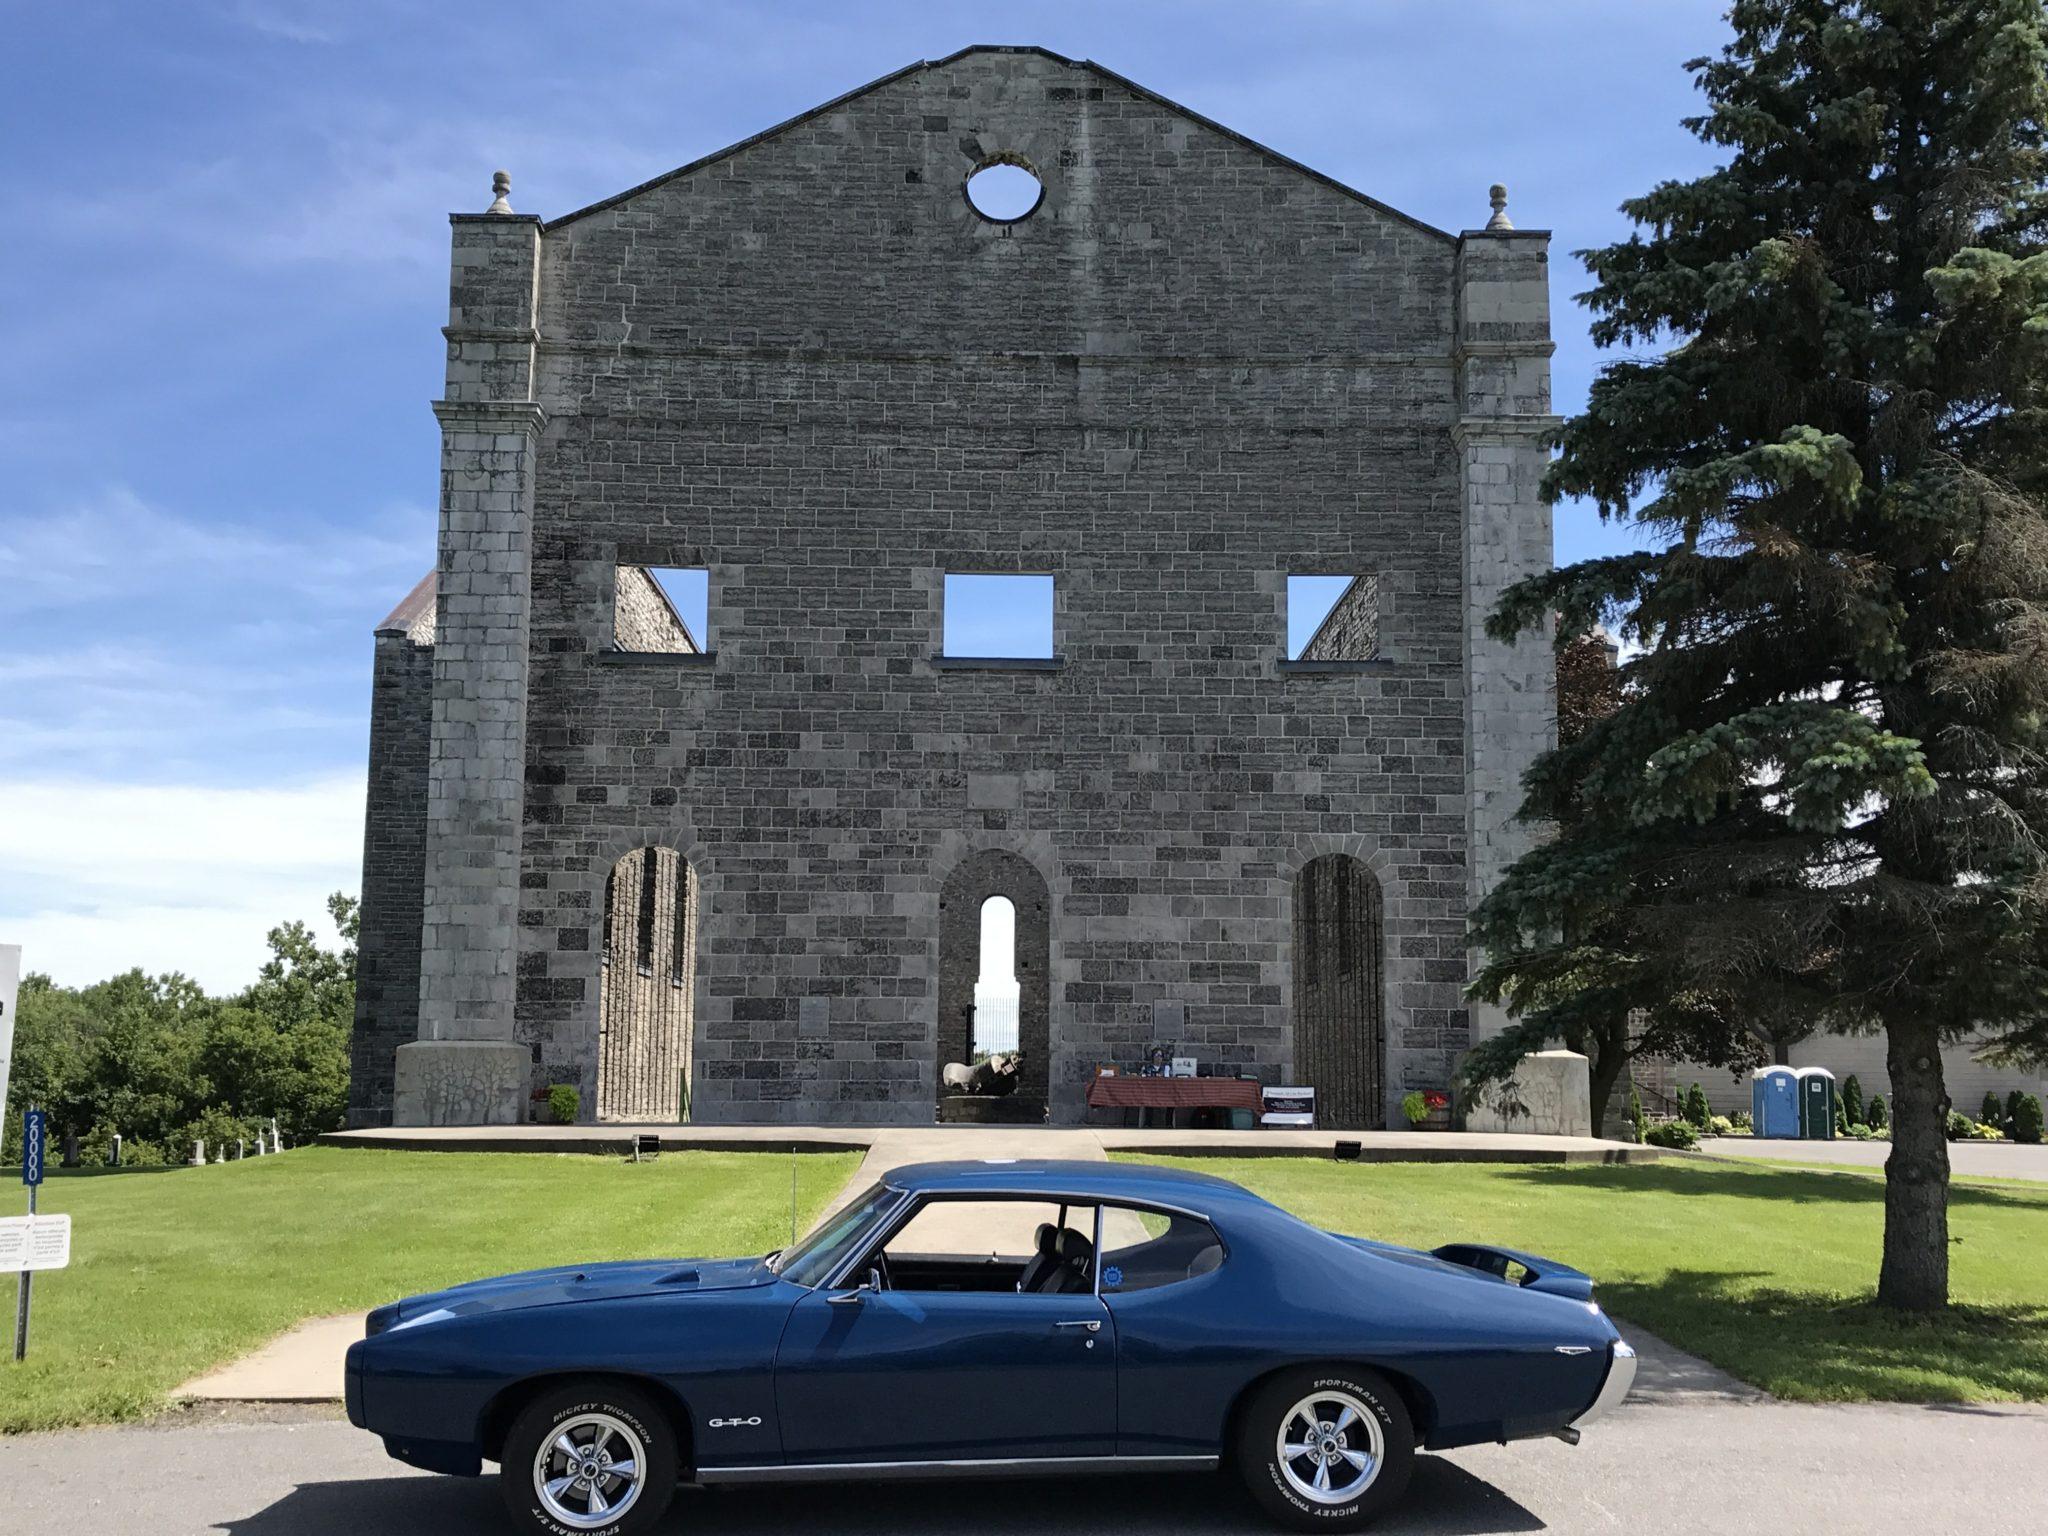 1969 Pontiac GTO St. Raphael's Ruins